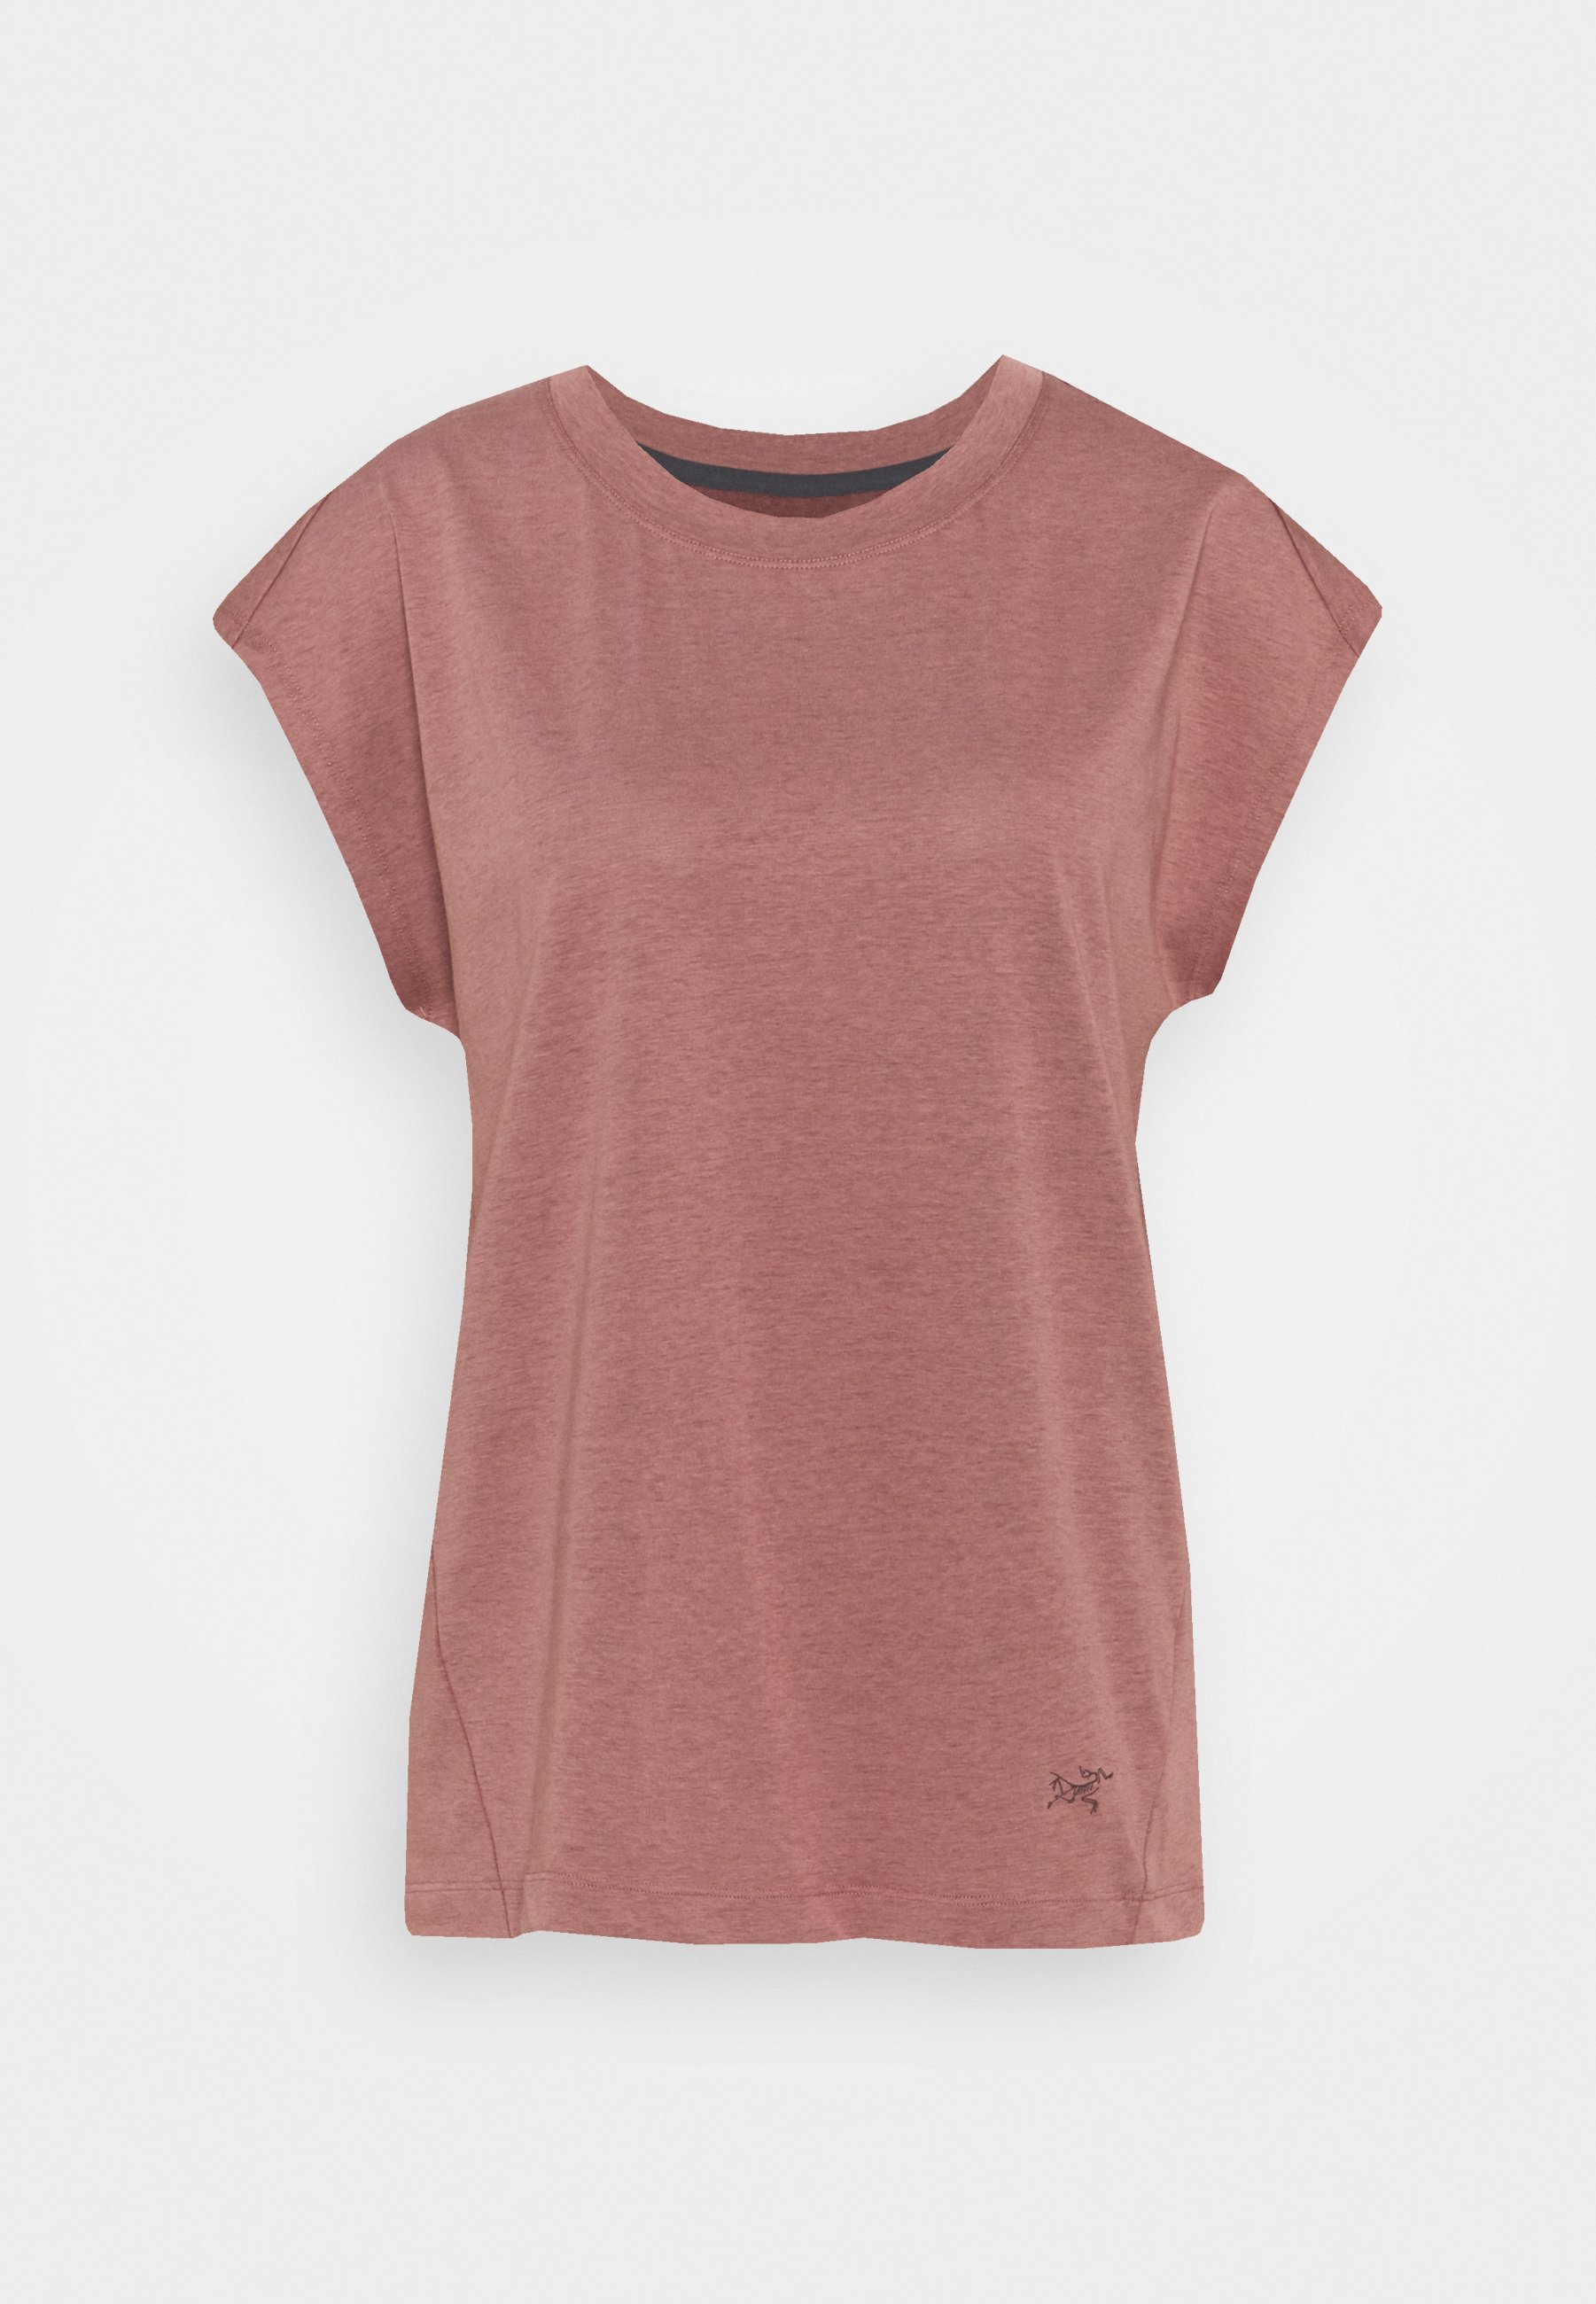 Women ARDENA TOP WOMEN'S - Basic T-shirt